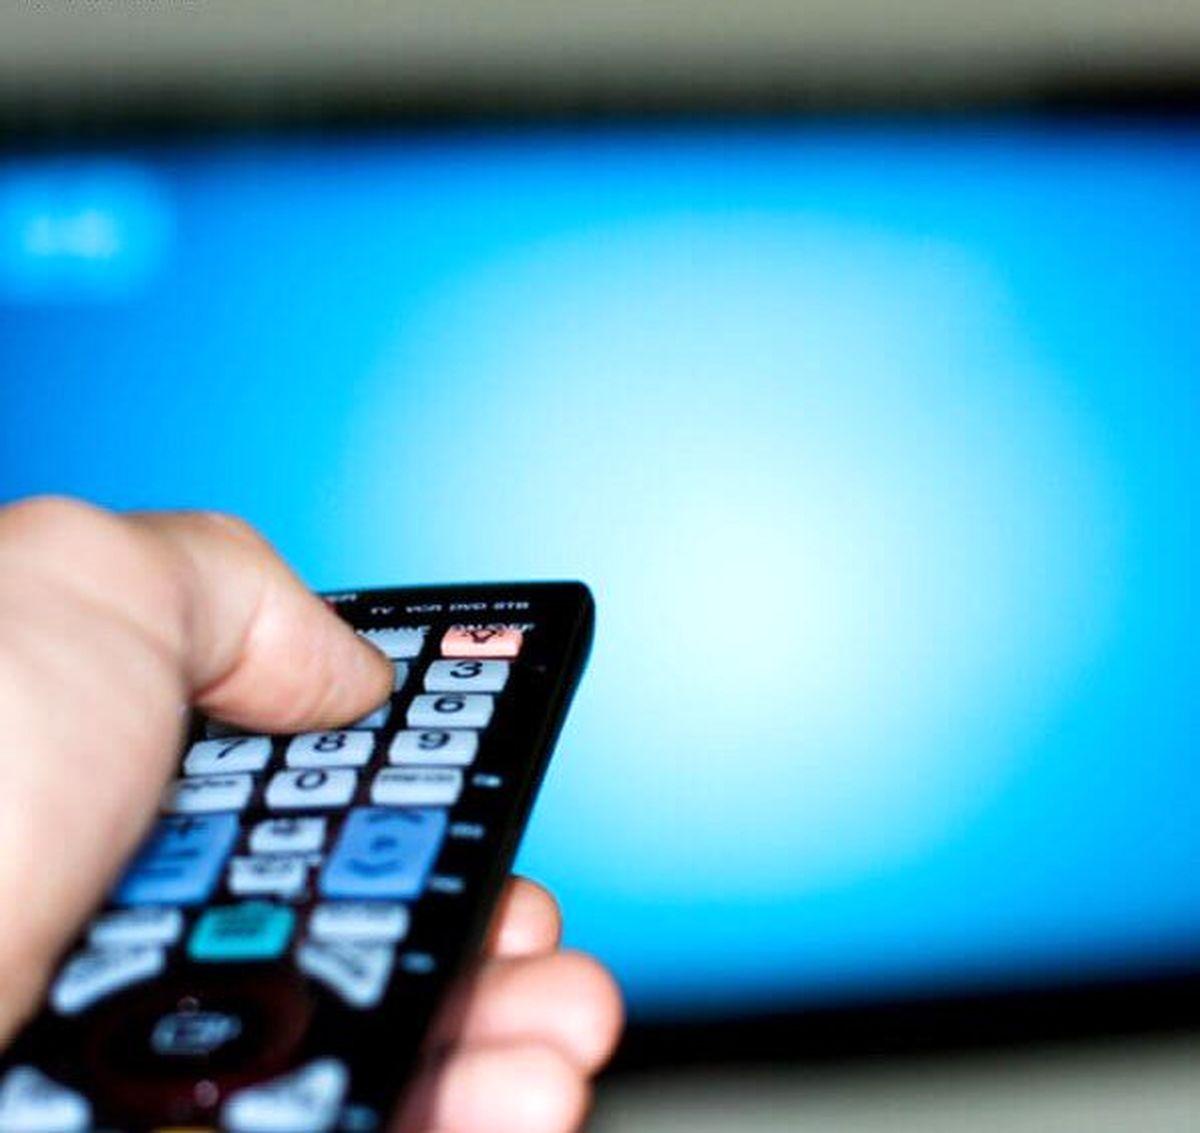 اسامی سریالهای تلویزیونی پربیننده